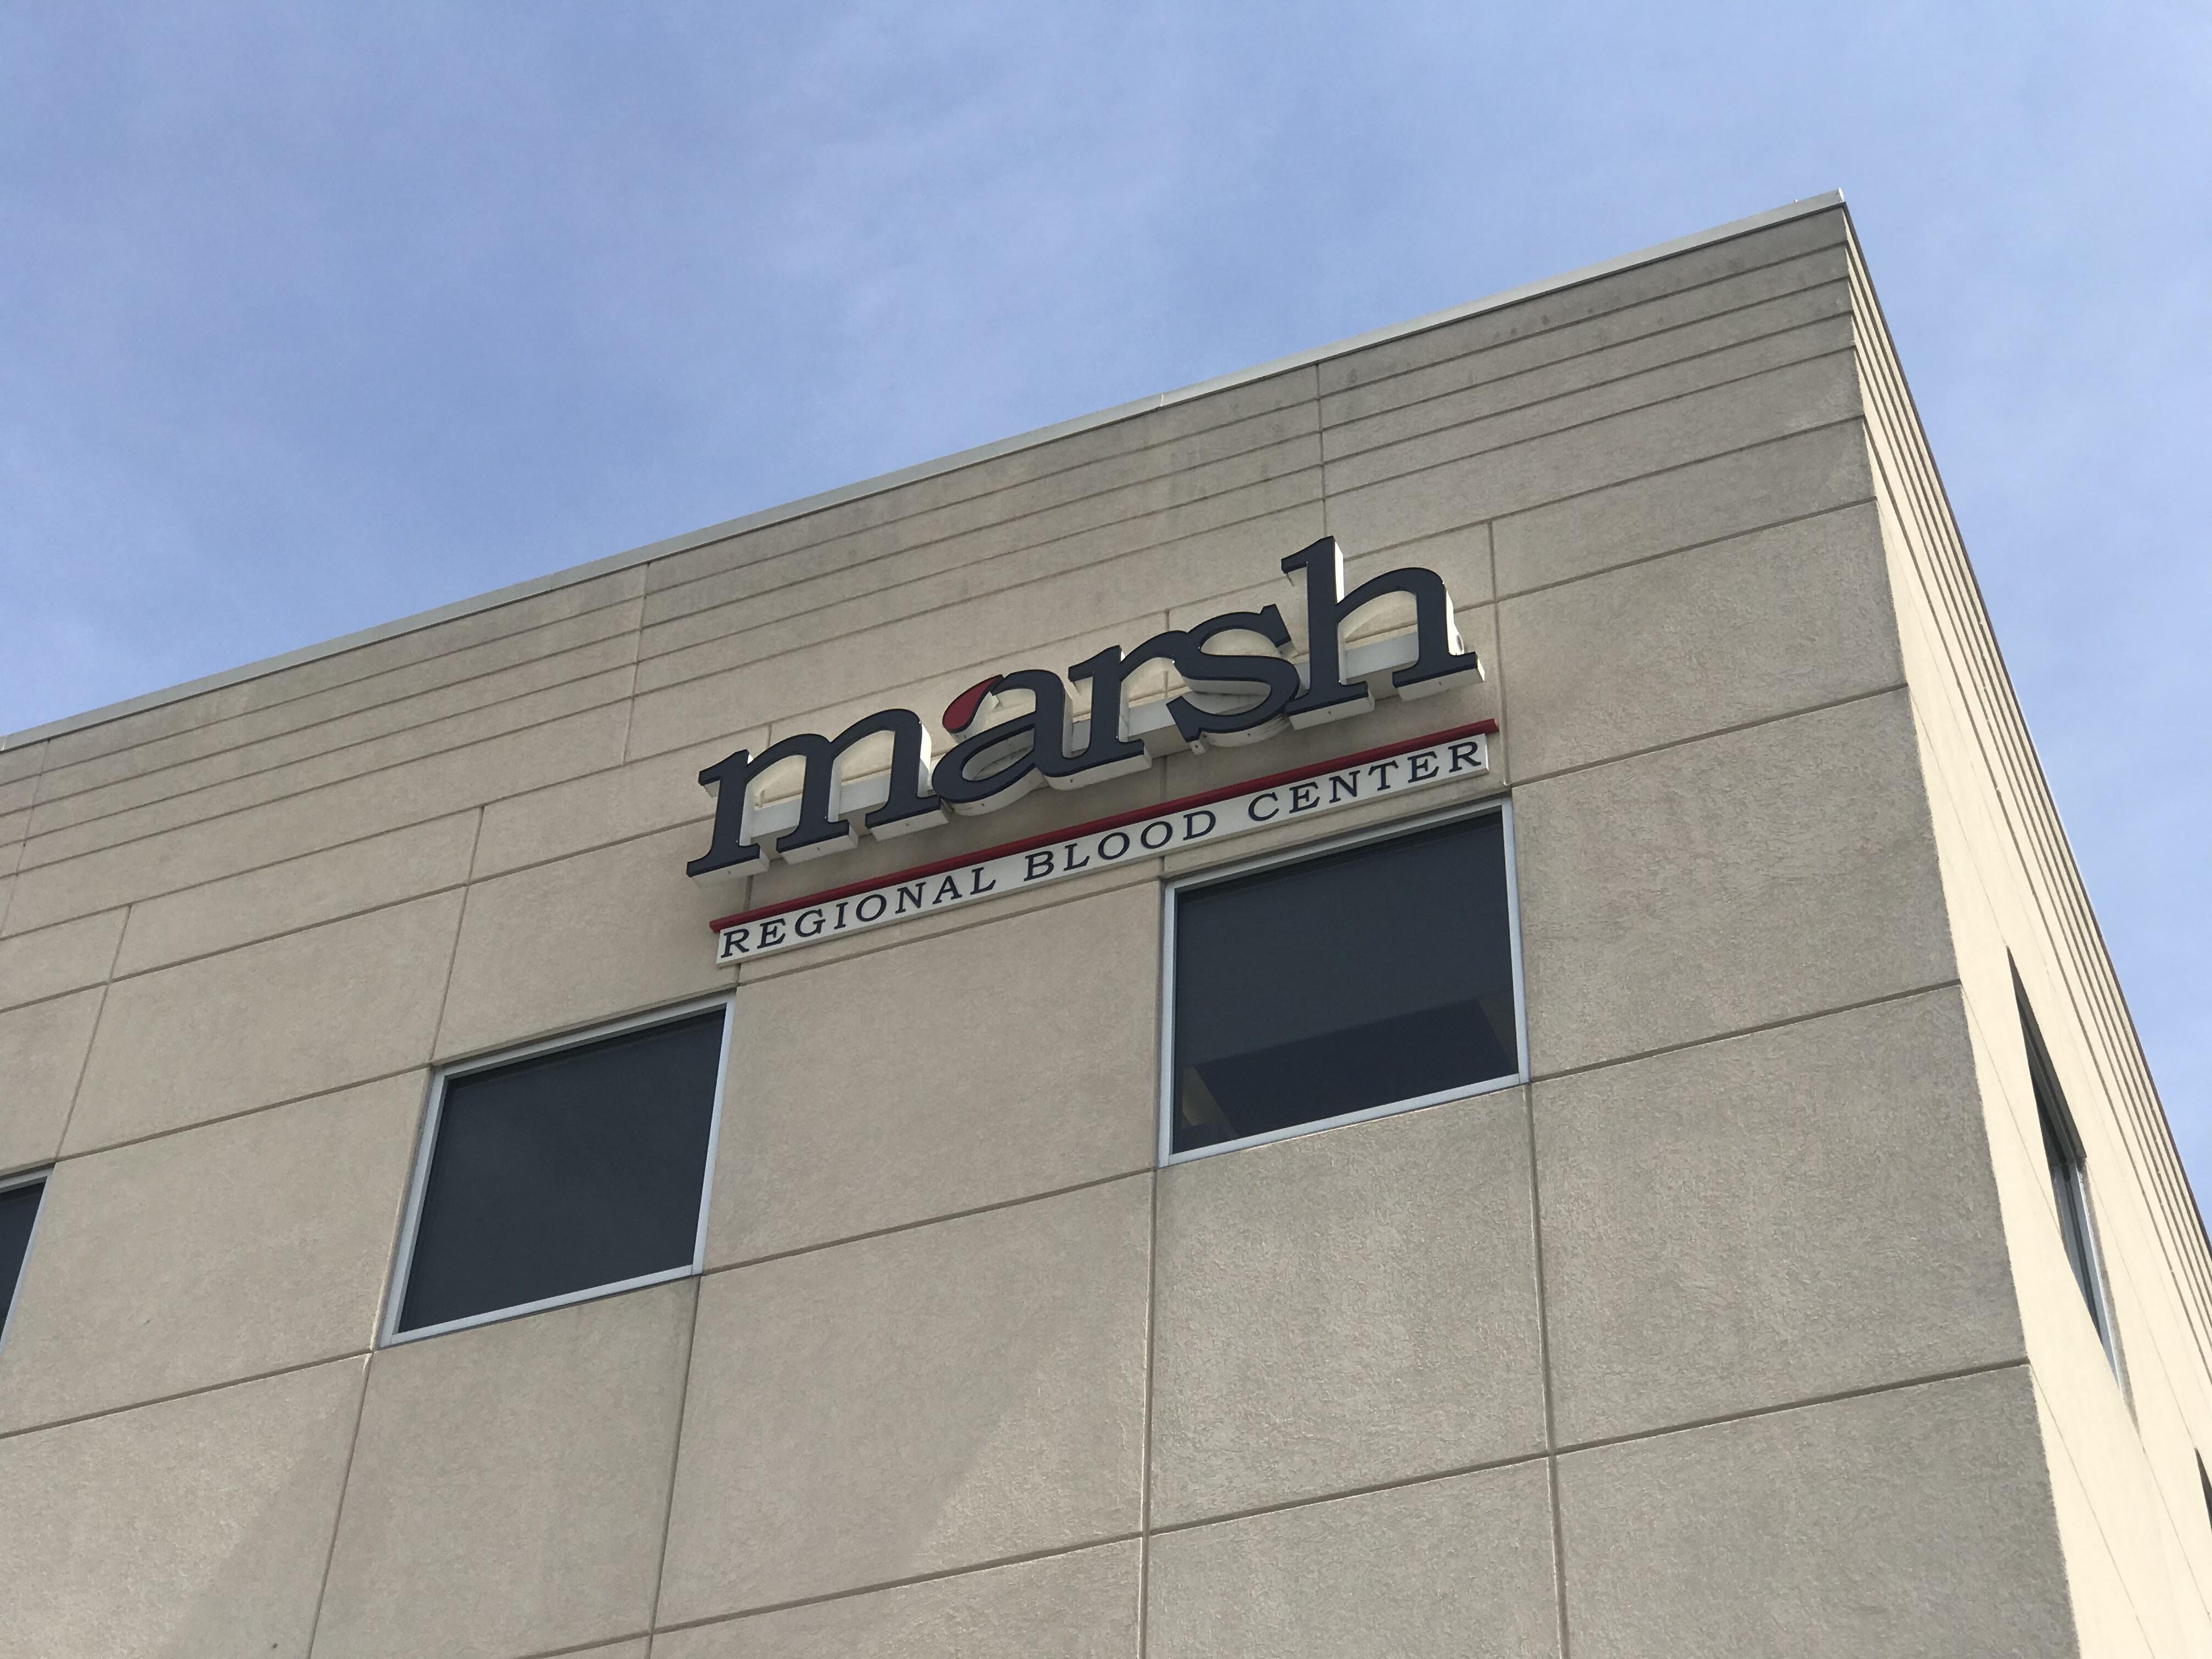 Marsh Regional Blood Center building in Kingsport